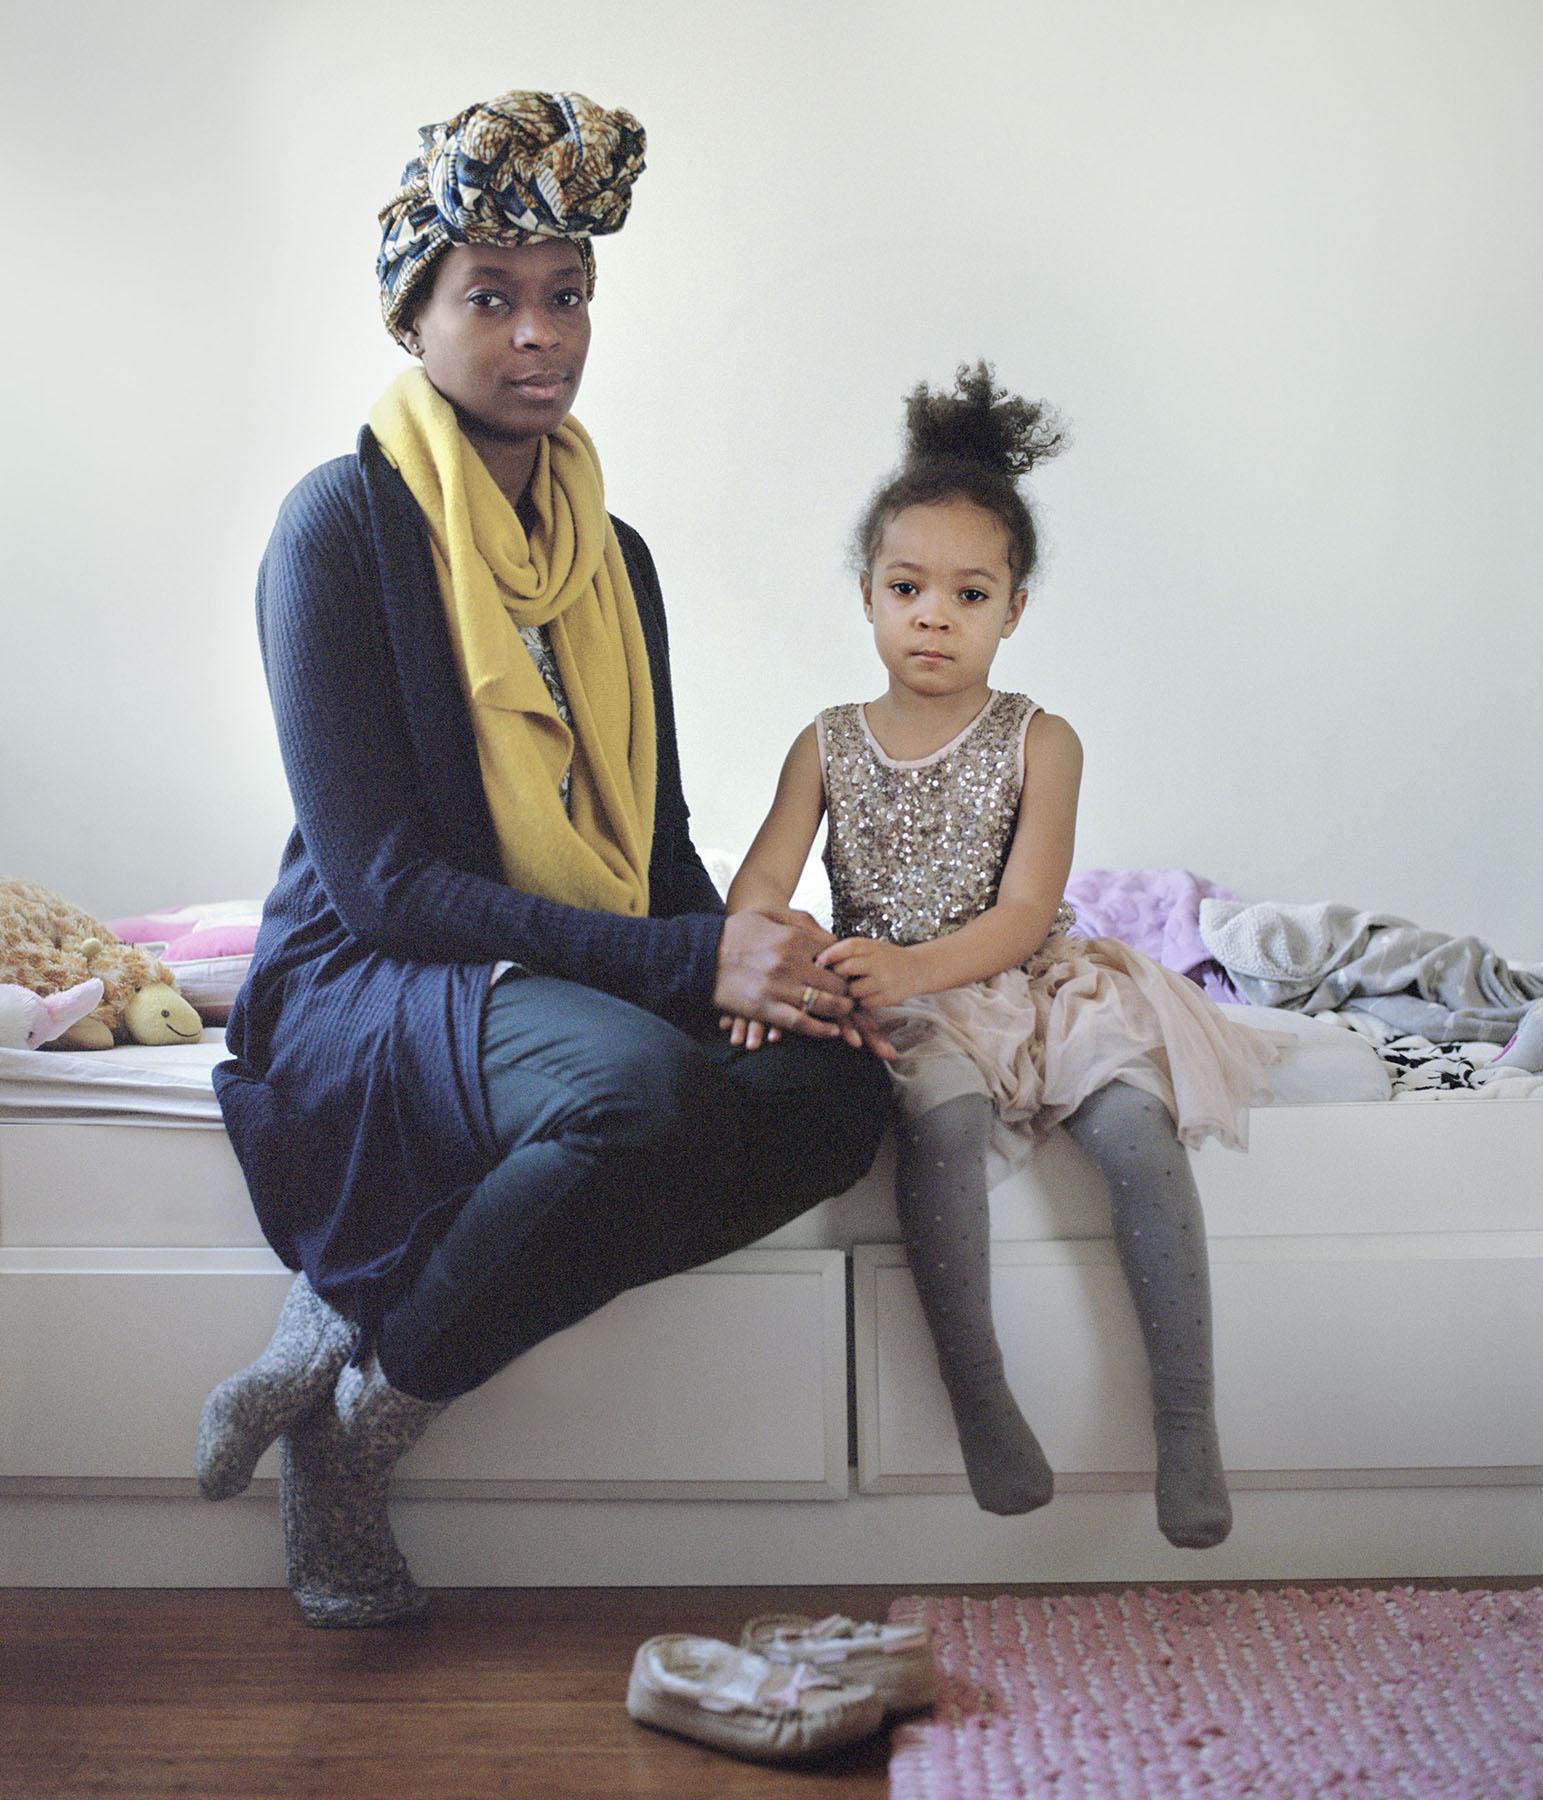 Eva_Ermert_Mothers&Daughters_Tomi&Abigail_1.jpg